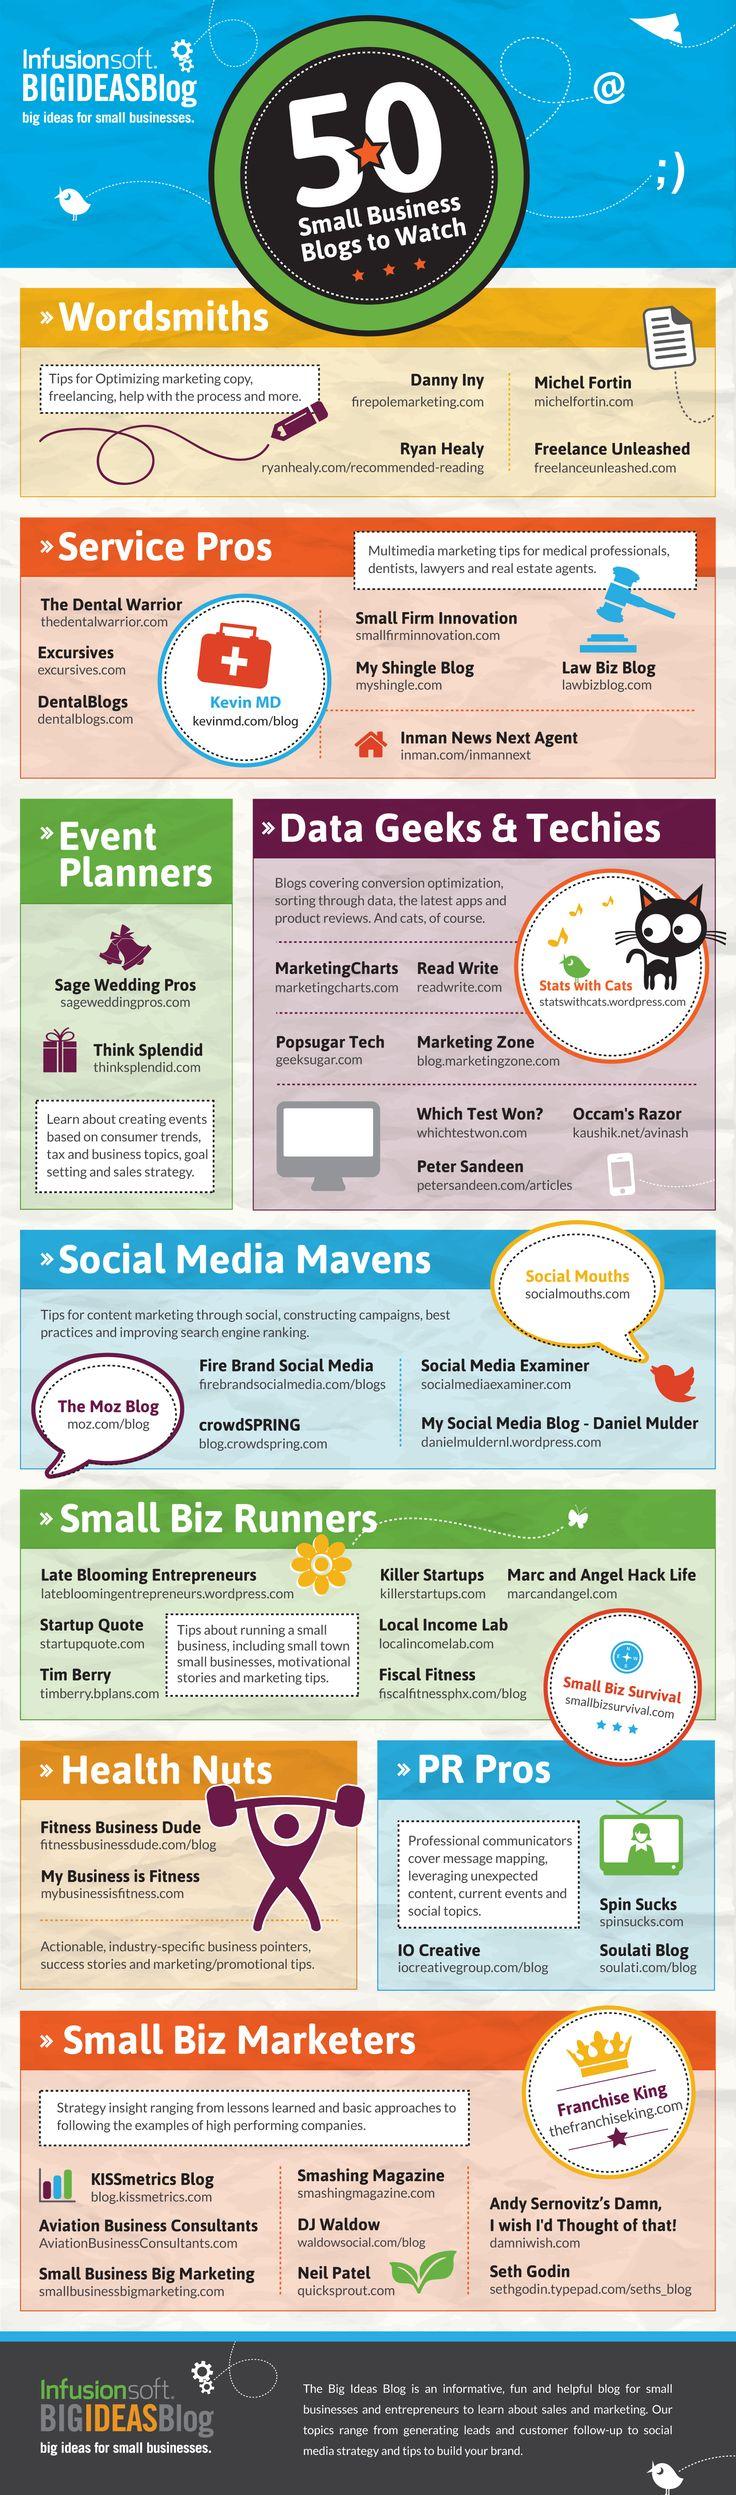 50 Best Small Business Blogs To Follow  http://www.digitalinformationworld.com/2013/08/50-best-small-business-blogs-to-follow.html  #Top50 #SmallBusiness #BlogToFollow